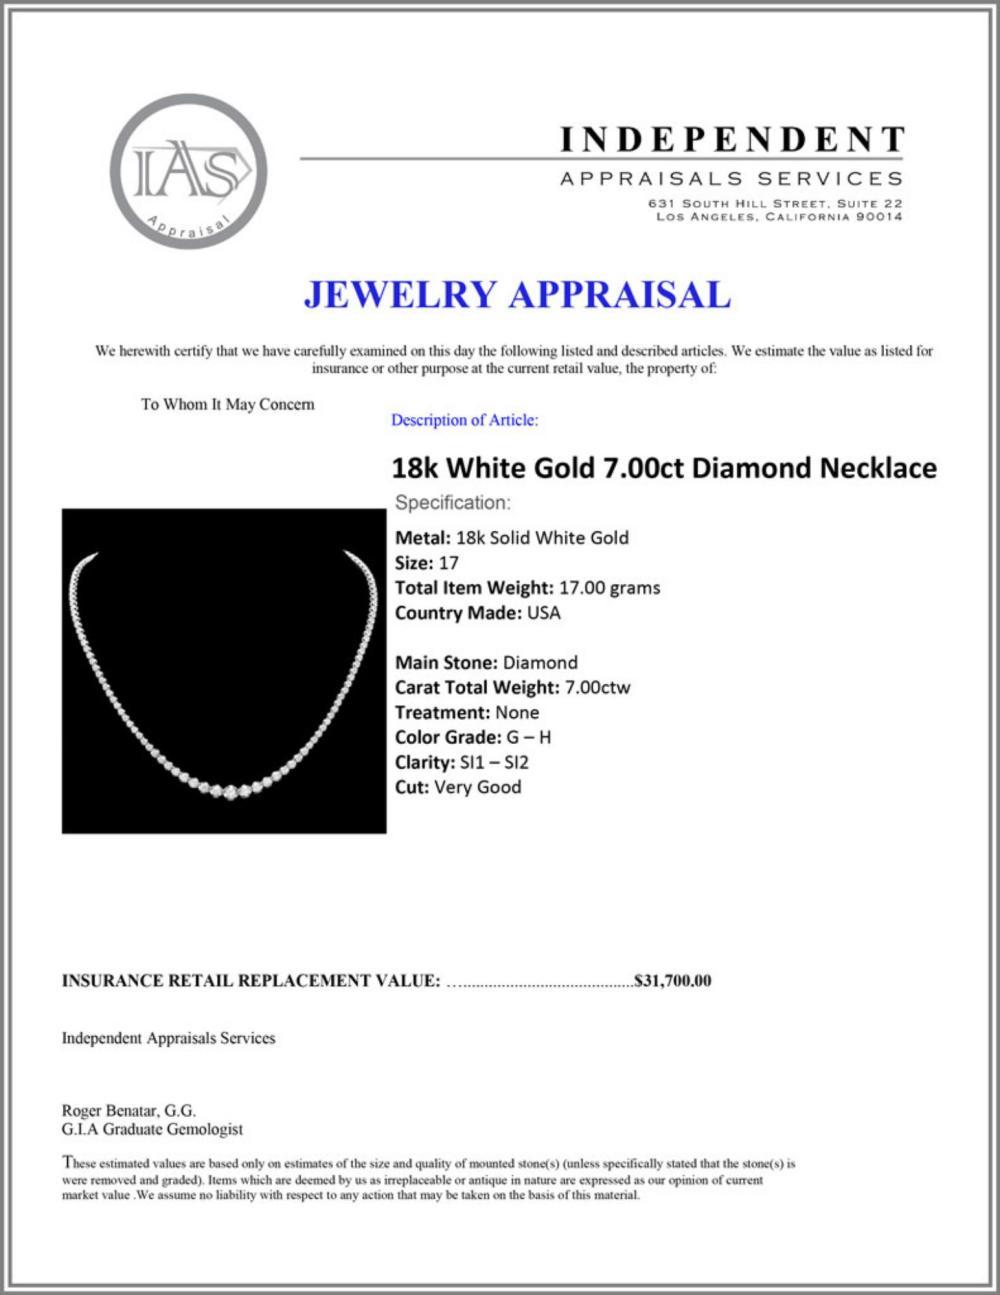 Lot 128: ^18k White Gold 7.00ct Diamond Necklace